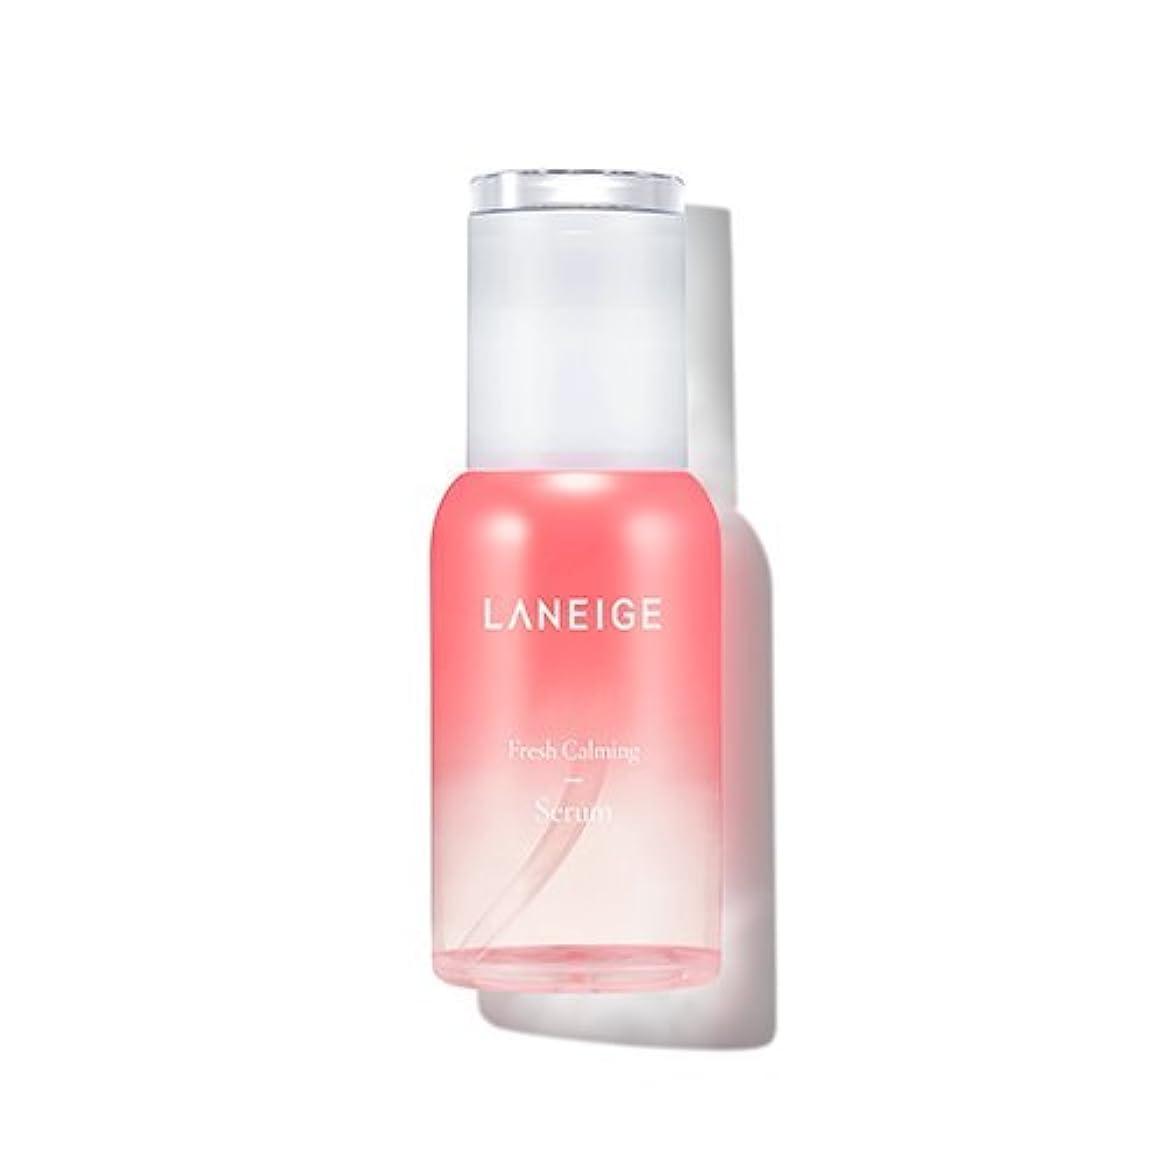 [New] LANEIGE Fresh Calming Serum 80ml/ラネージュ フレッシュ カーミング セラム 80ml [並行輸入品]